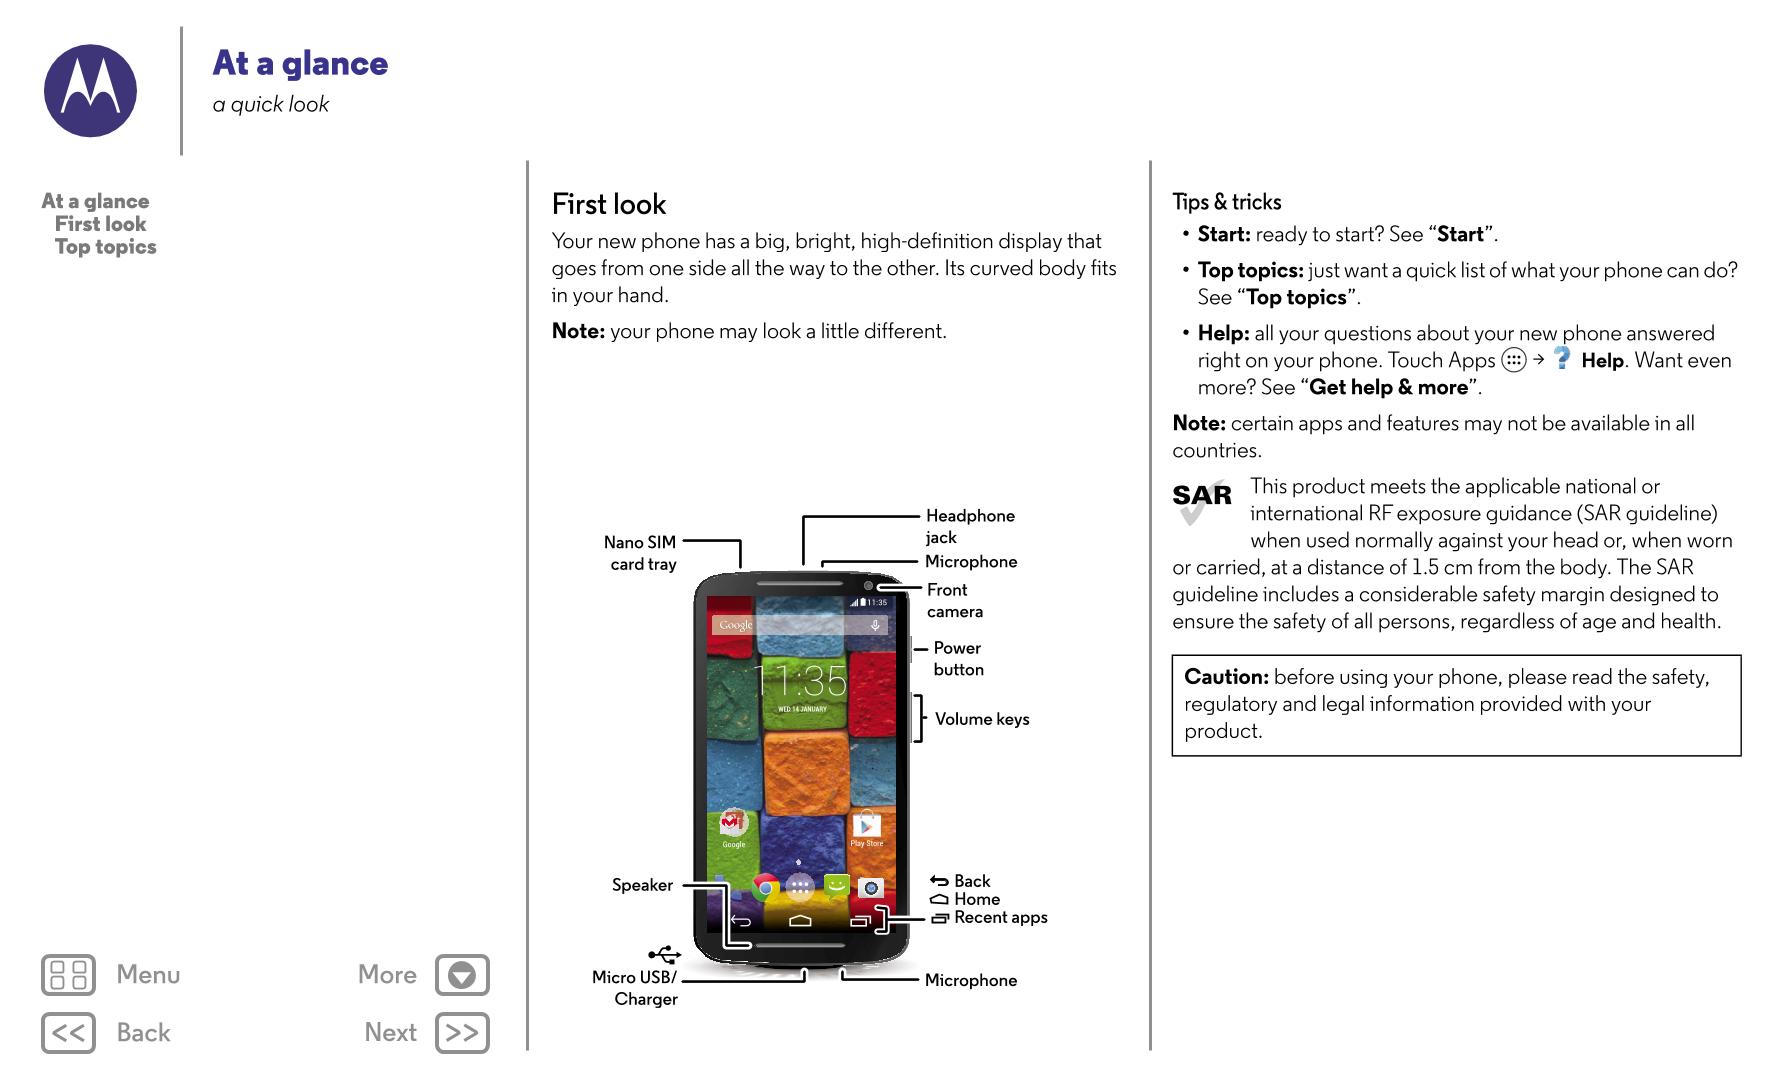 User manual for Motorola Moto X (2nd Generation)